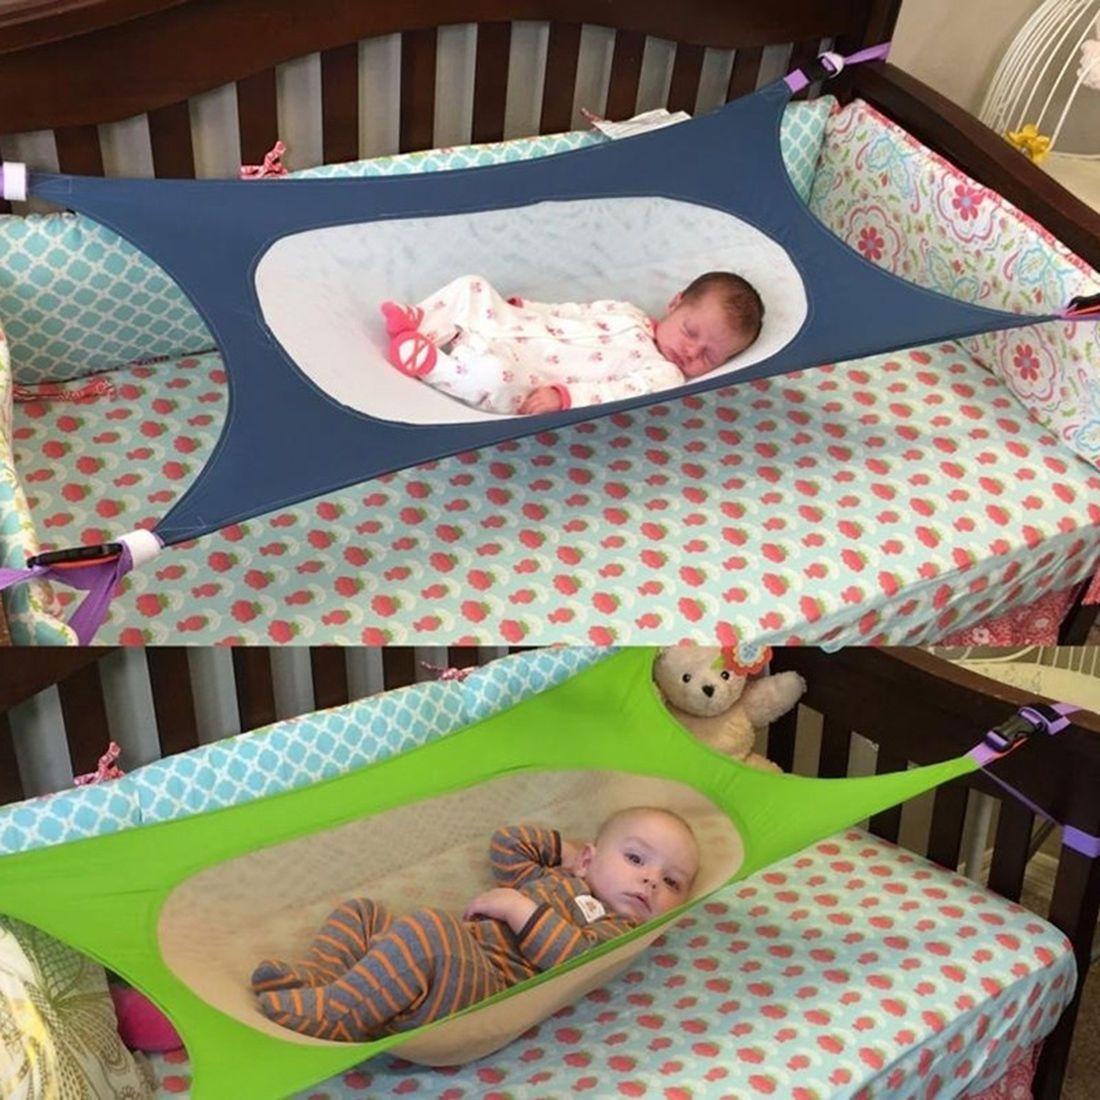 Newborn baby crib hammock healthy development for little baby